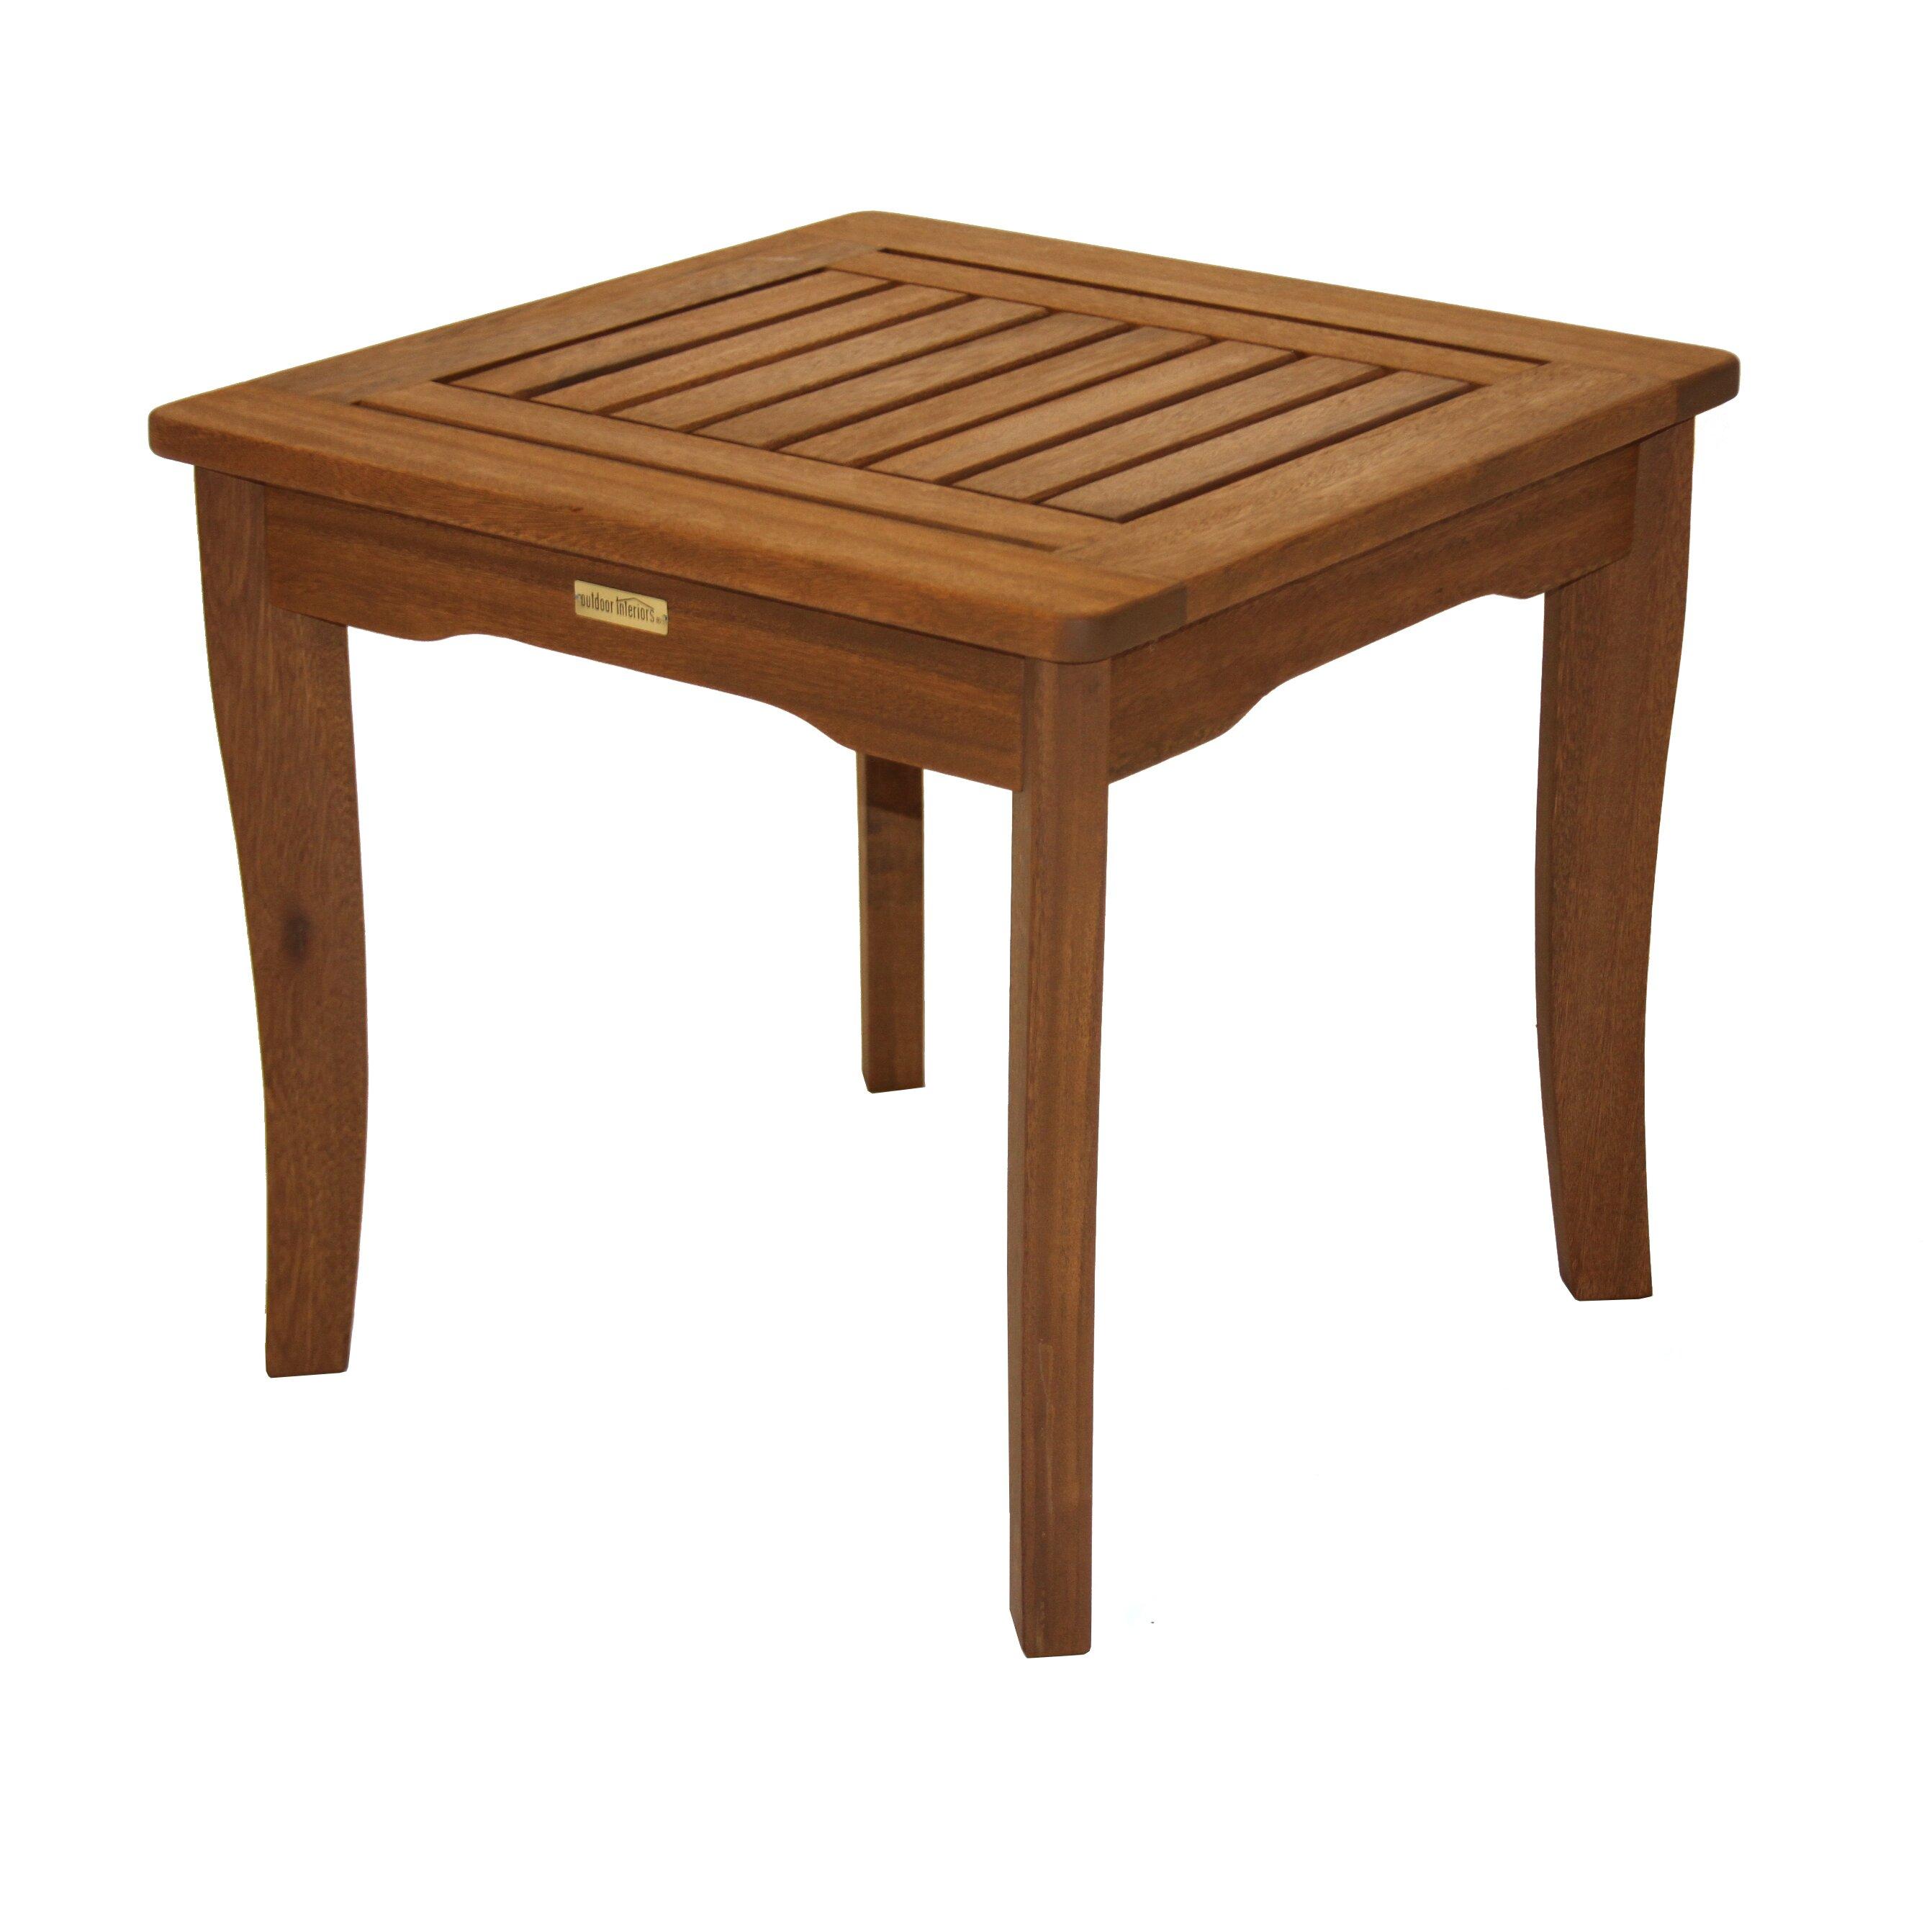 Outdoor Interiors Eucalyptus End Table Amp Reviews Wayfair